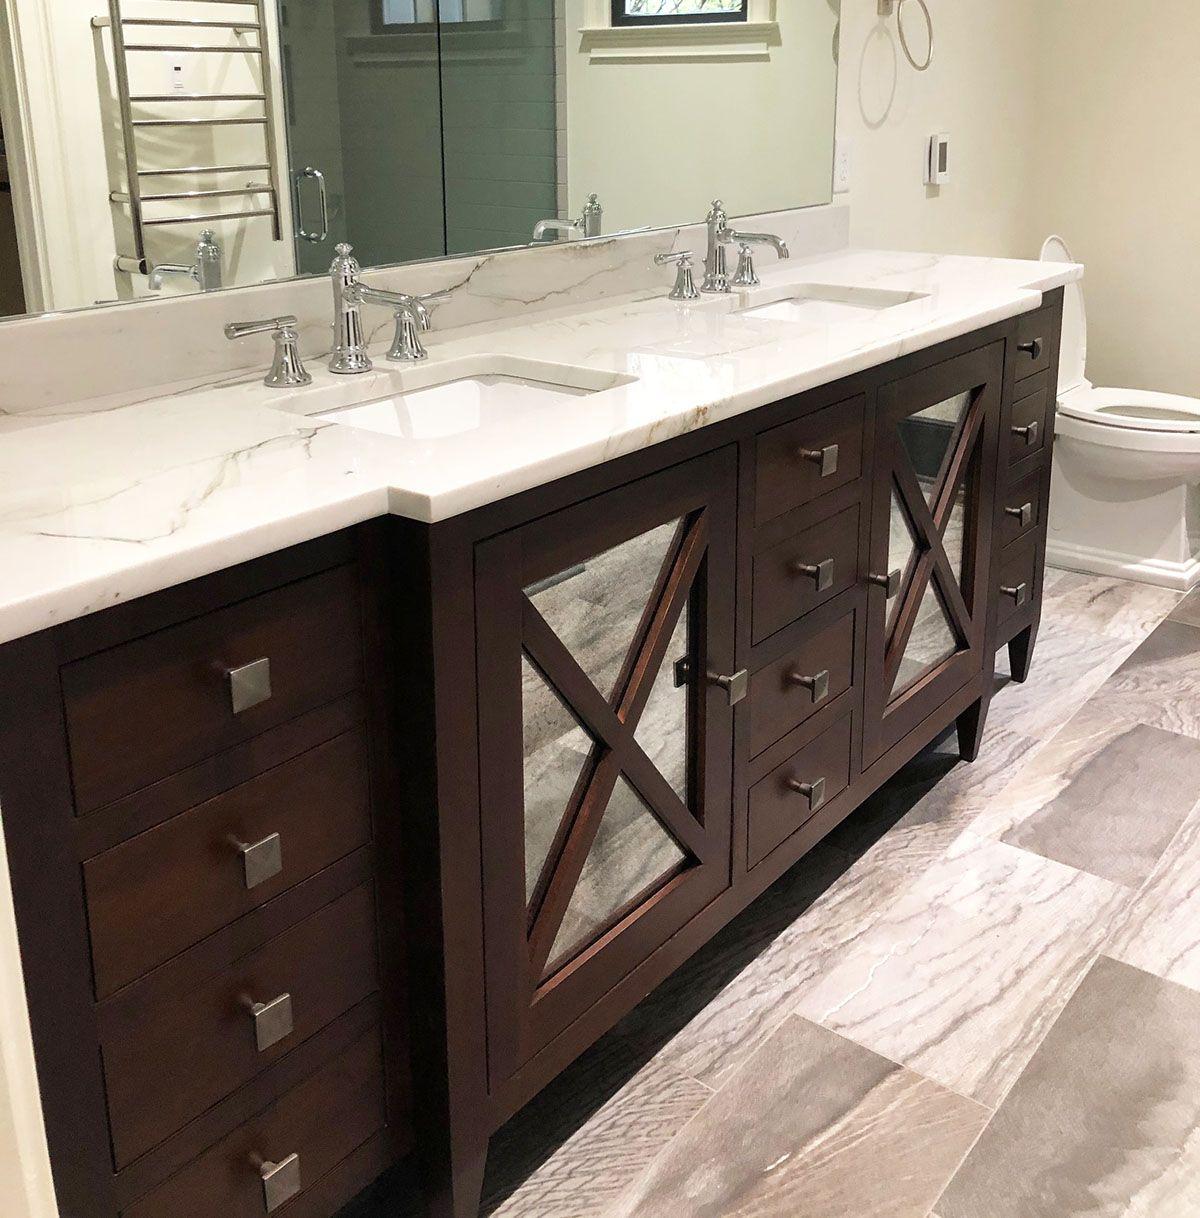 Double Abilene Sink Base Bathroom Inspiration Decor Bathroom Vanity Drawers Diy Bathroom Vanity [ 1218 x 1200 Pixel ]